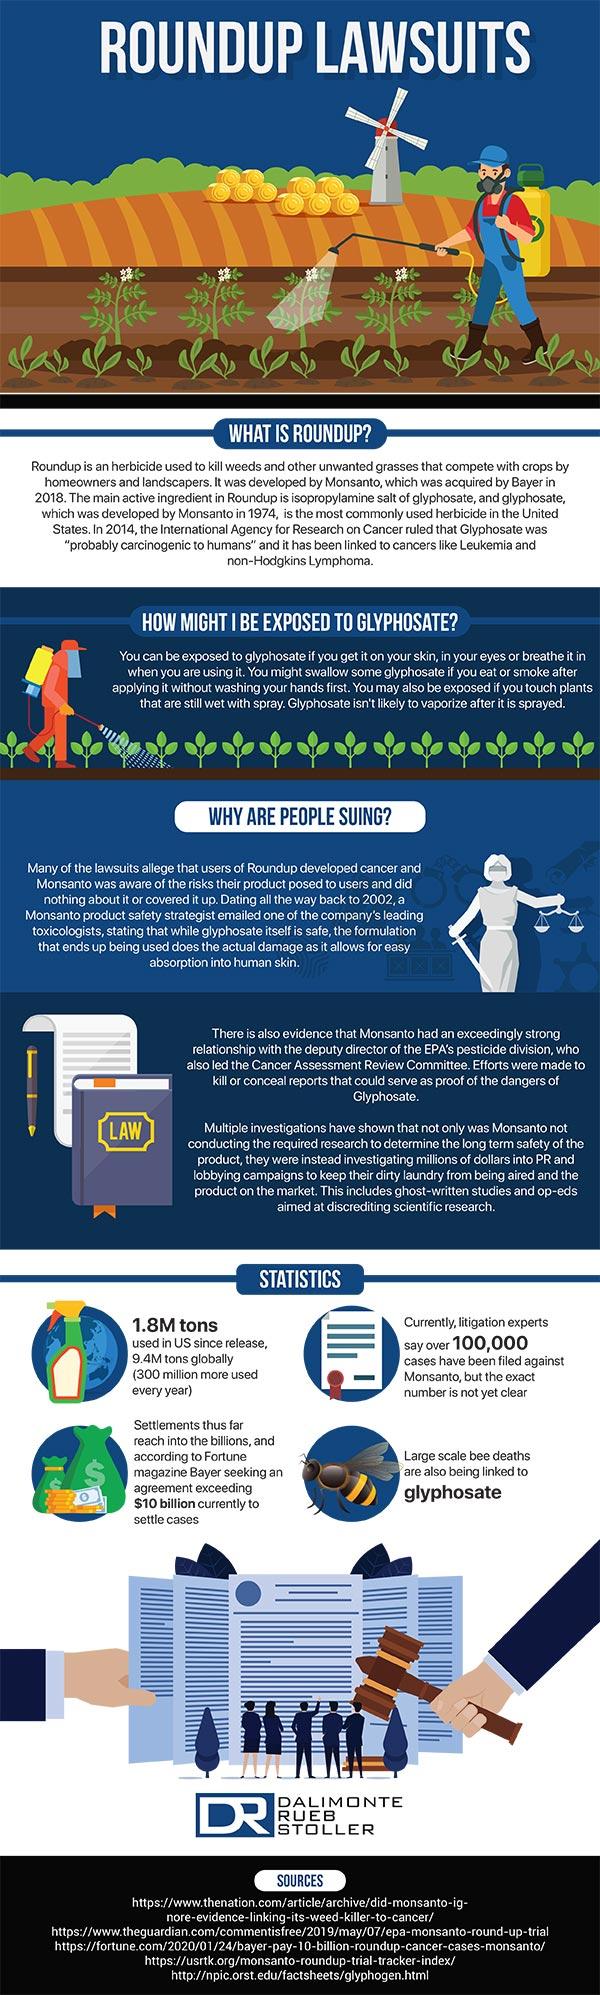 Dalimonte Rueb Stoller LLP - Round Up Infographic